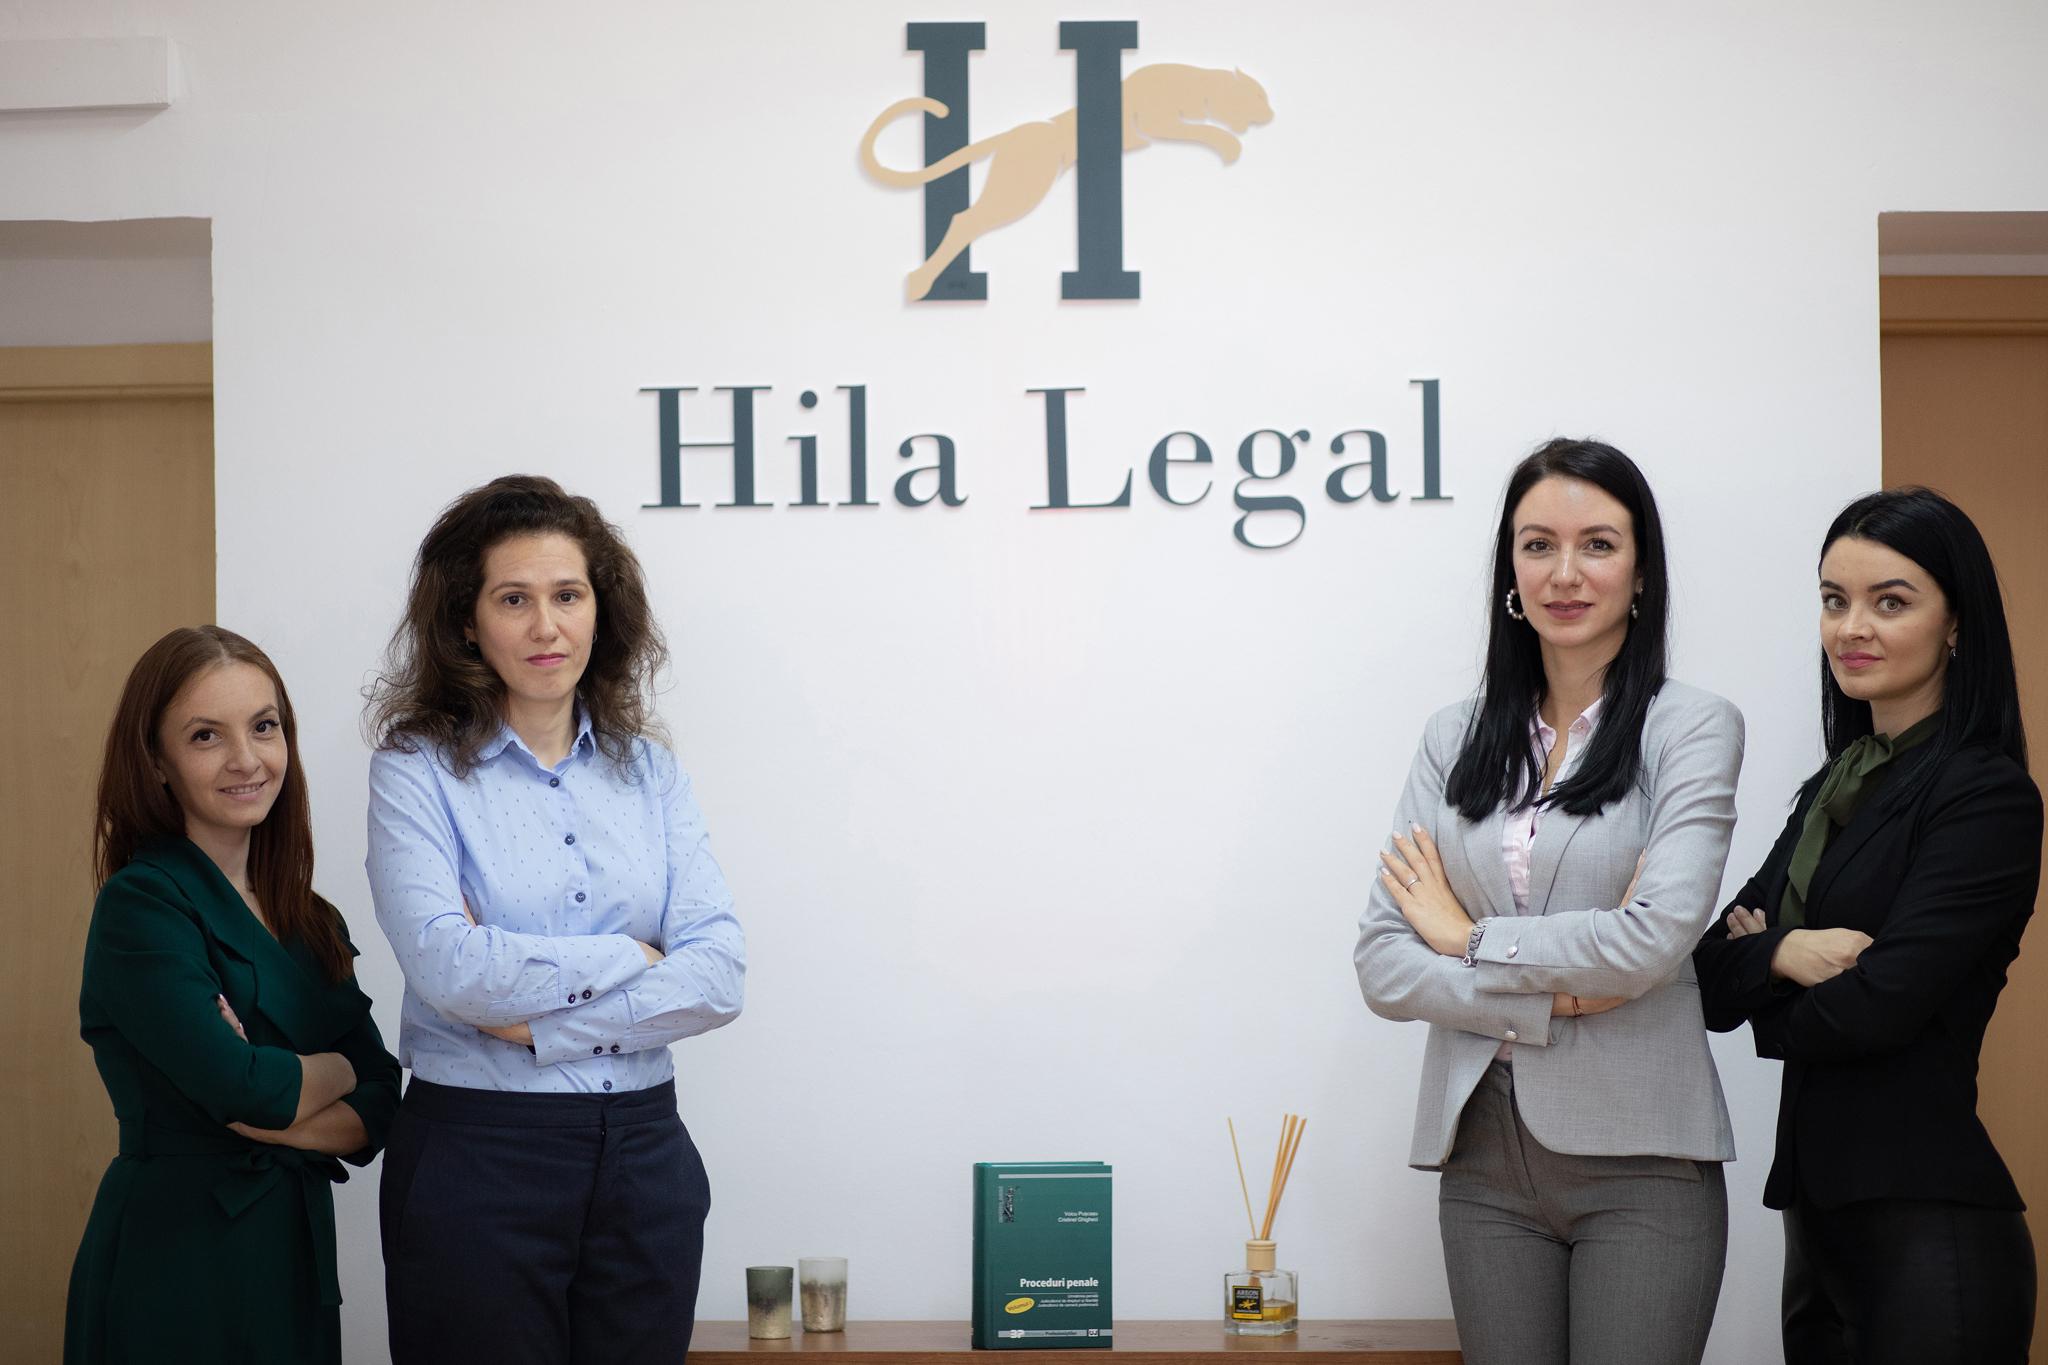 Echipa Hila Legal - Alexandra Hila, Ema Patrascu, Romana Bantas, Mihaela Ignia